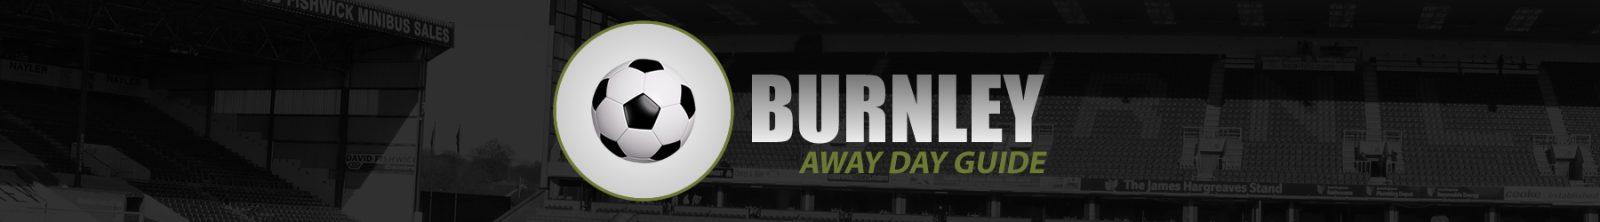 Burnley Away